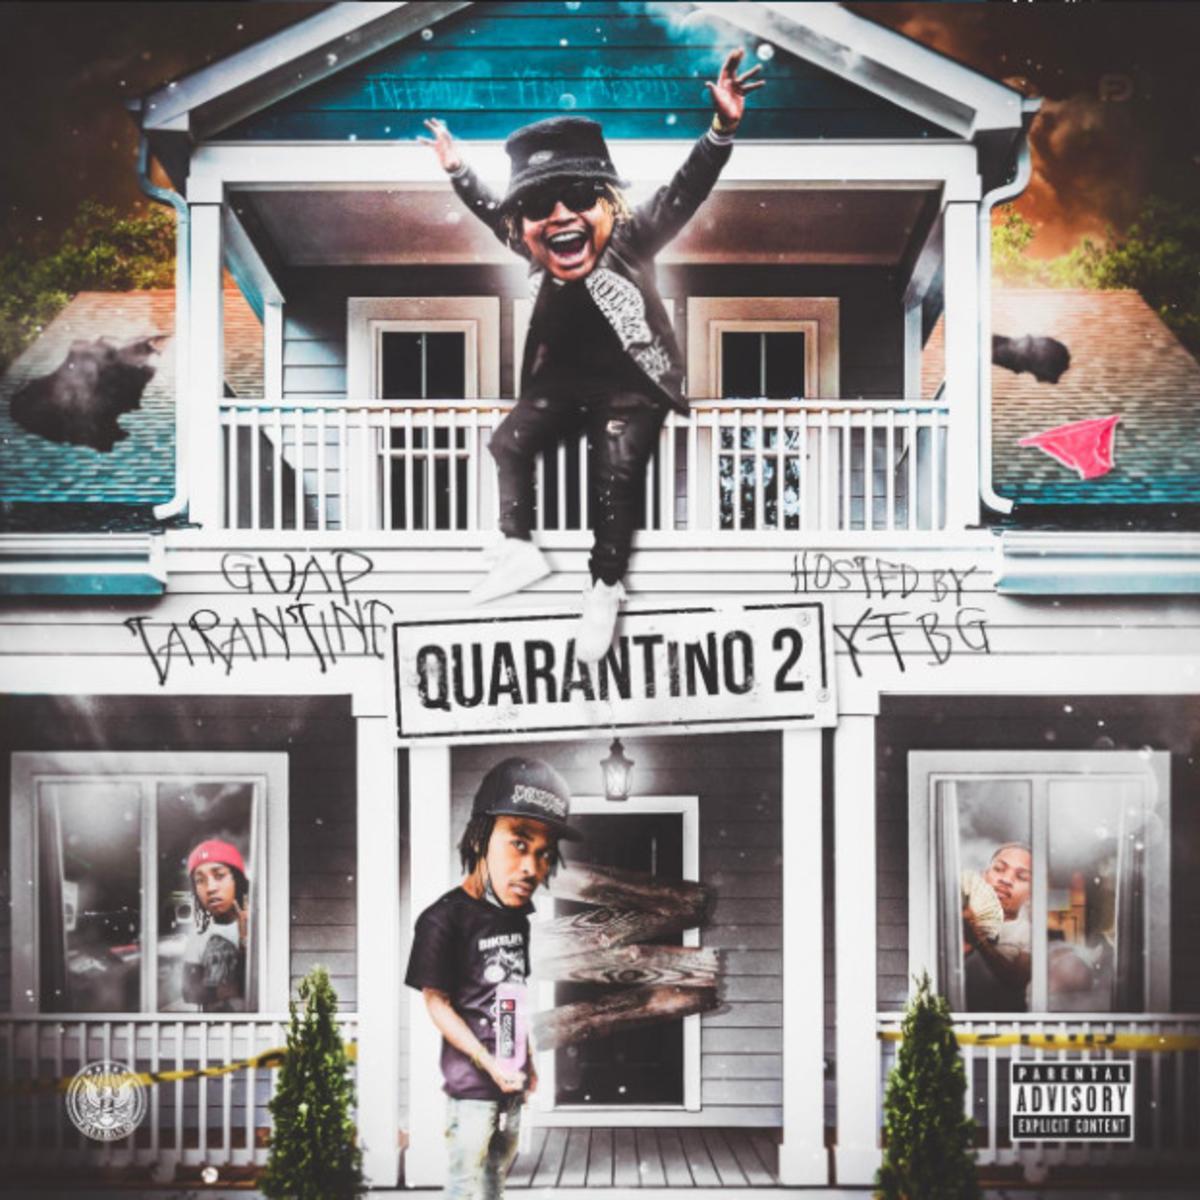 Guap Tarantino Feat. Lil Uzi Vert - Of Course